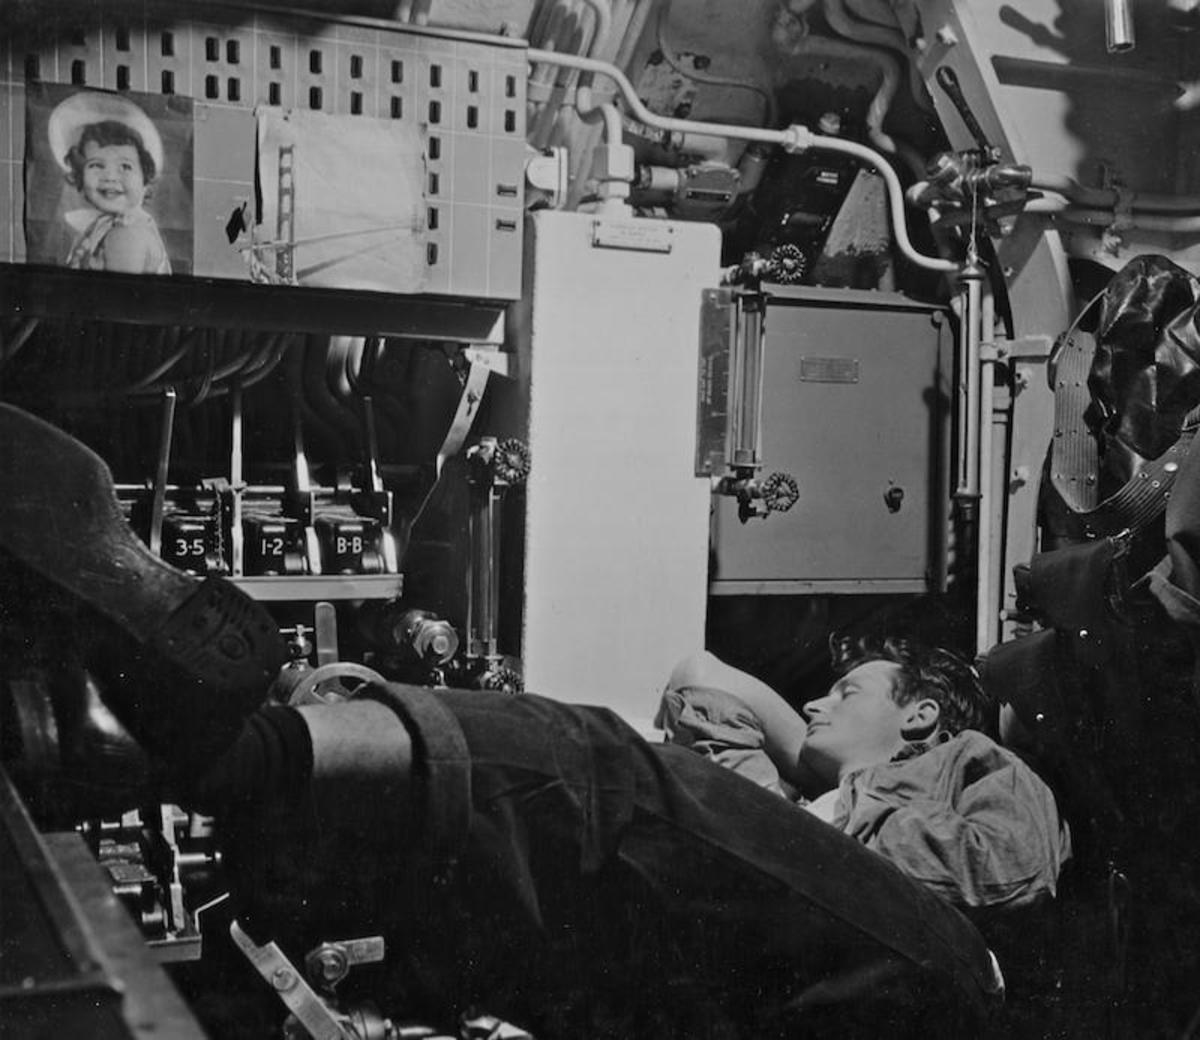 The USS Batfish: Rest Break